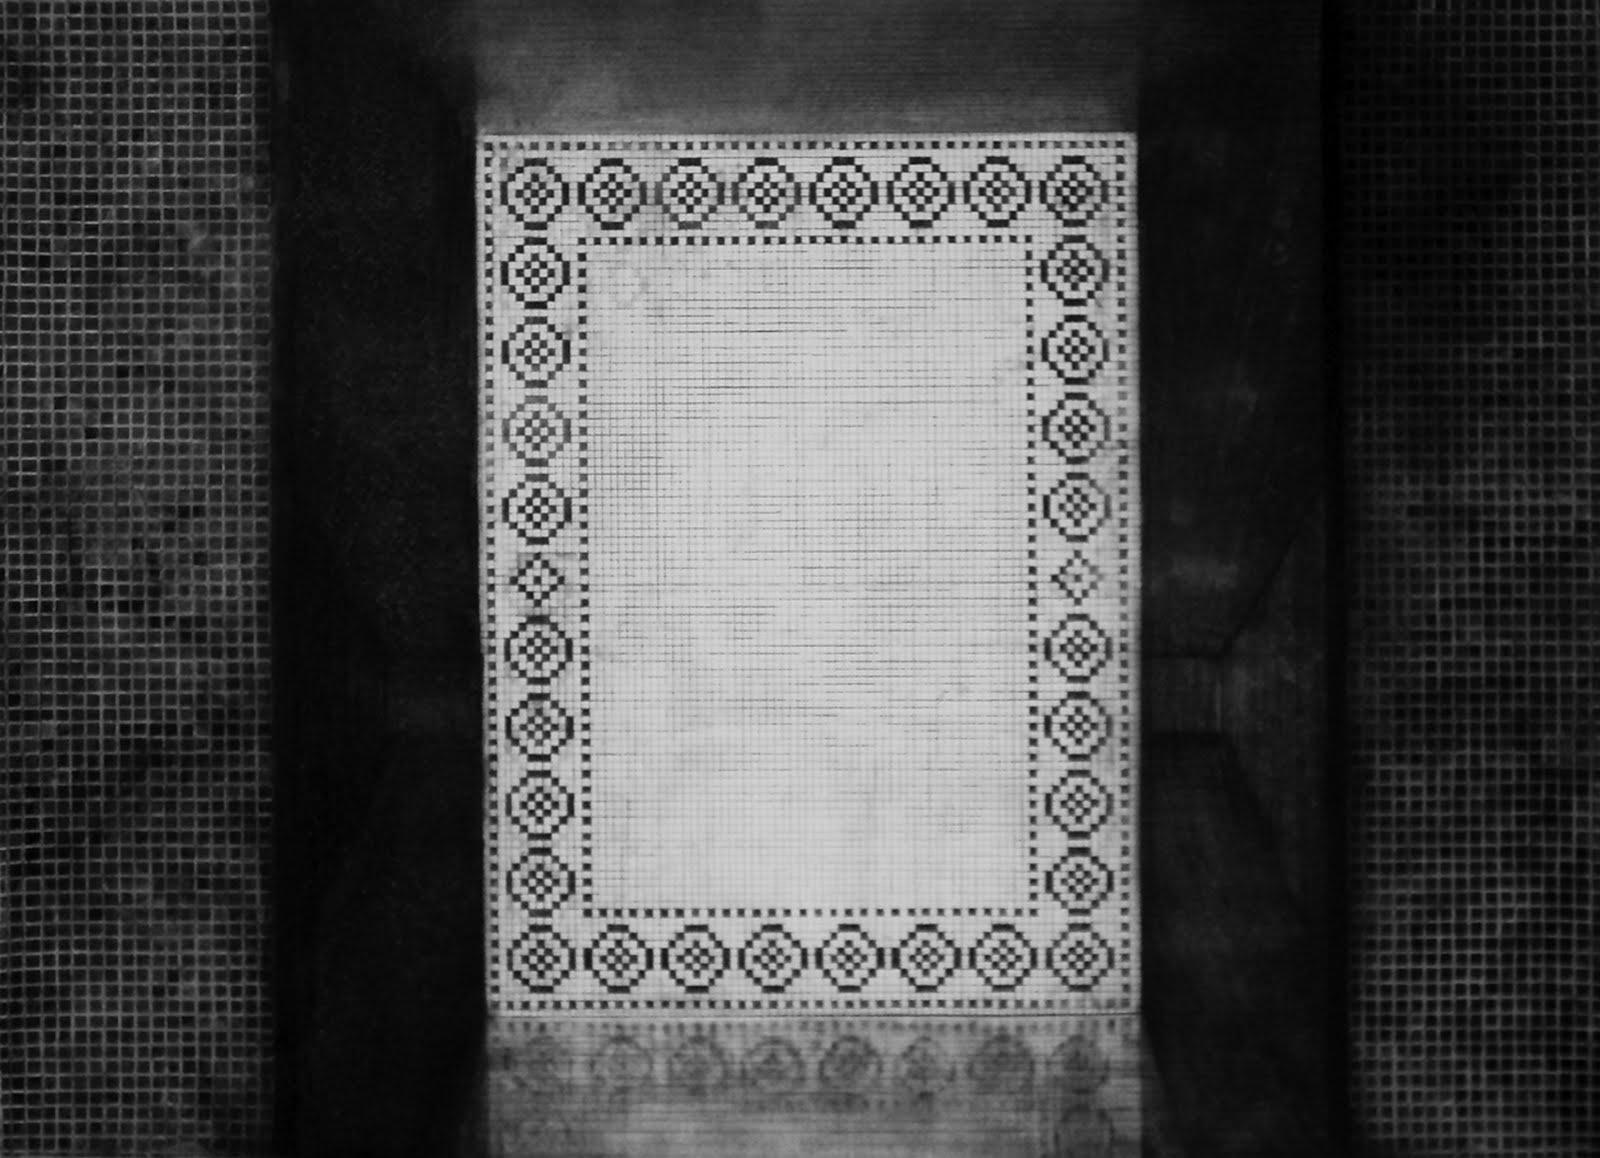 How To Create A Greyscale Bathroom: Brecht Evens: Hannelore Van Dijck